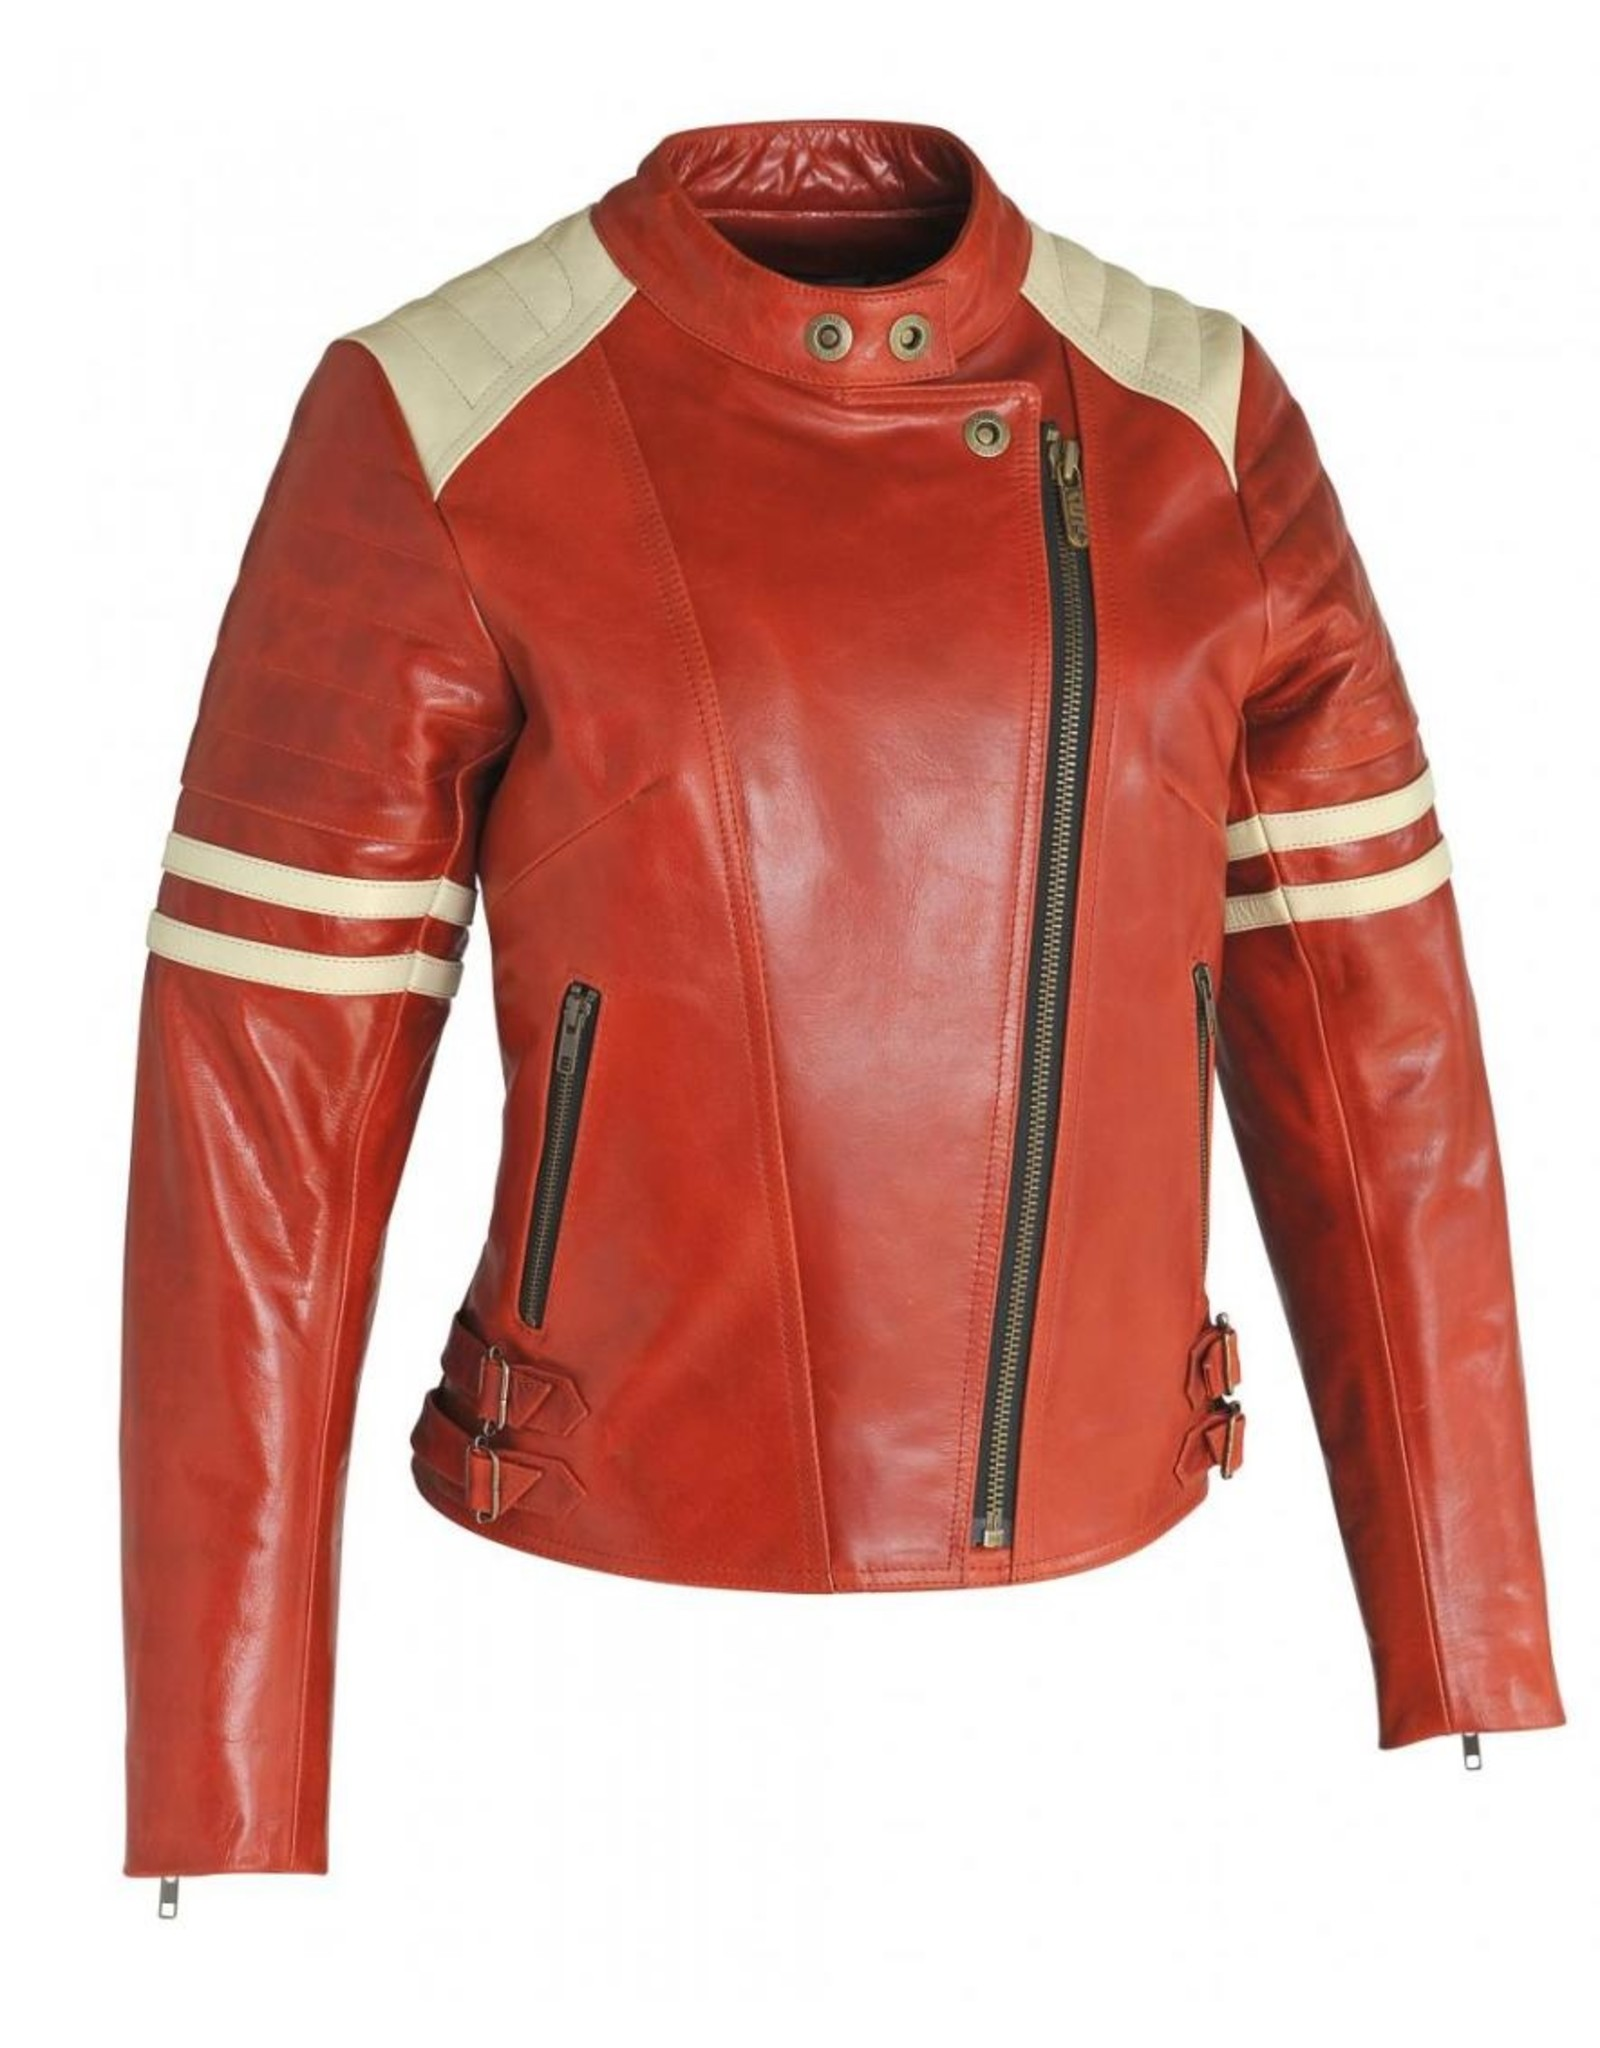 Guns Vintage Jacket, women